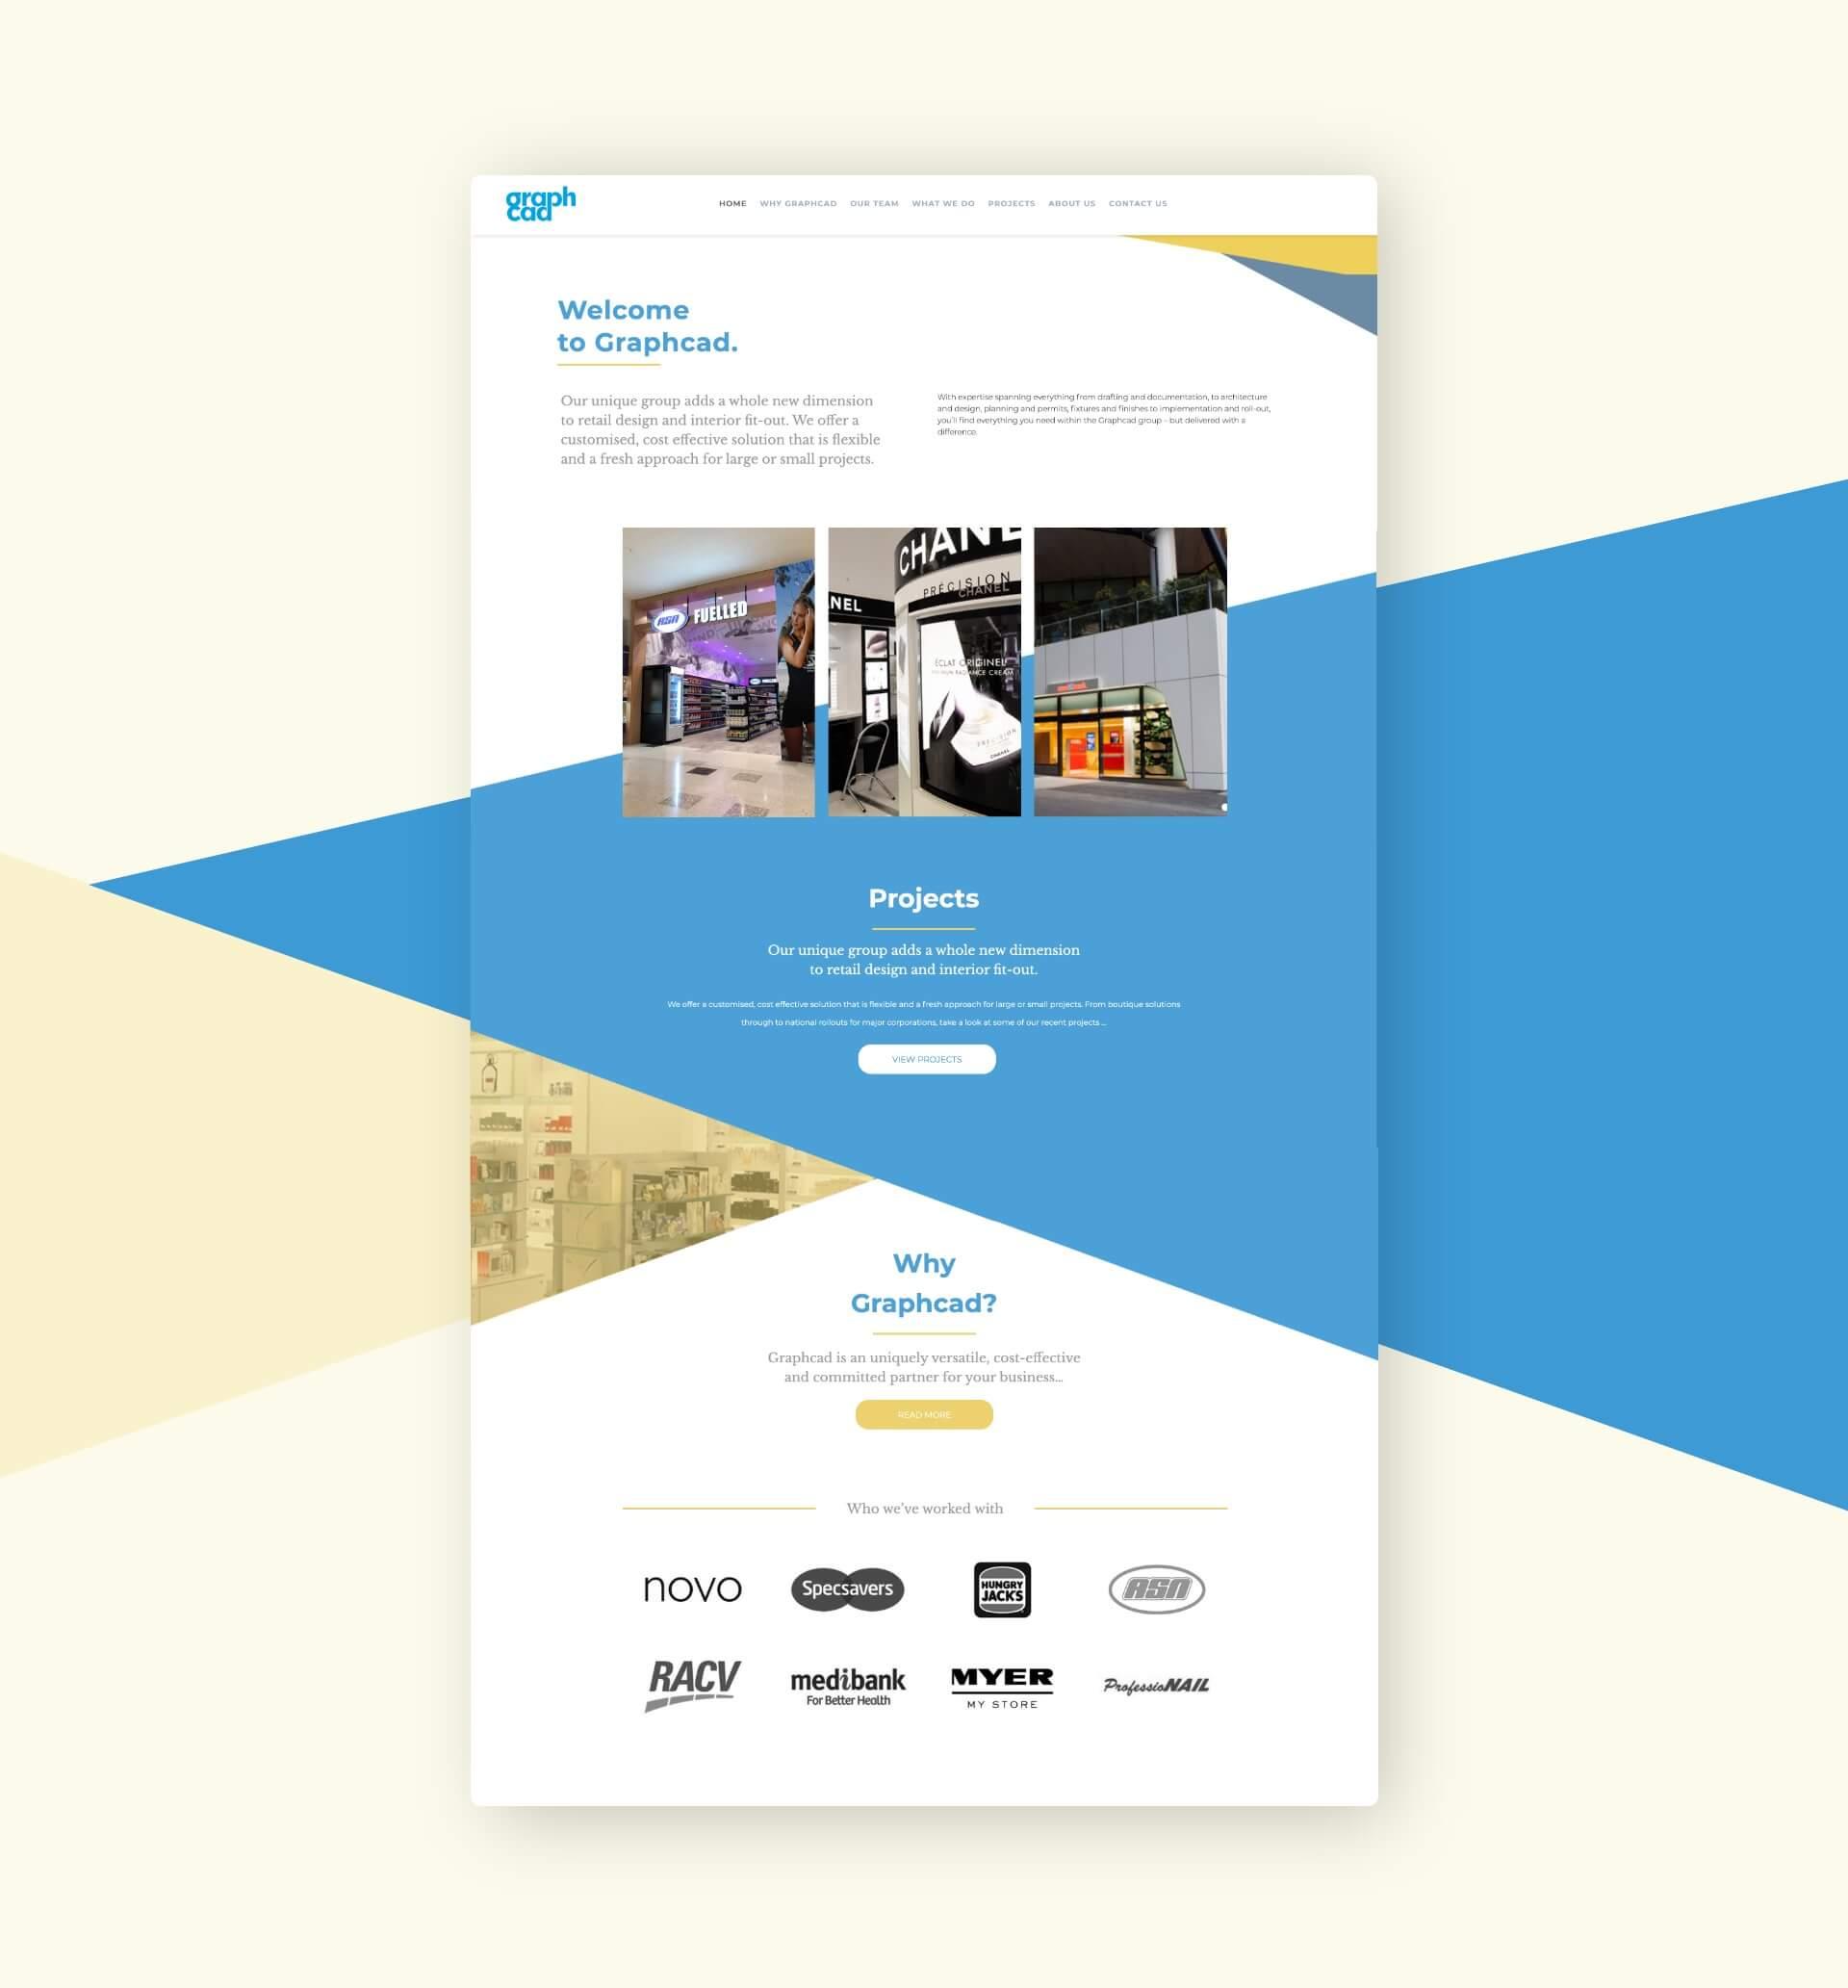 Graphcad homepage design